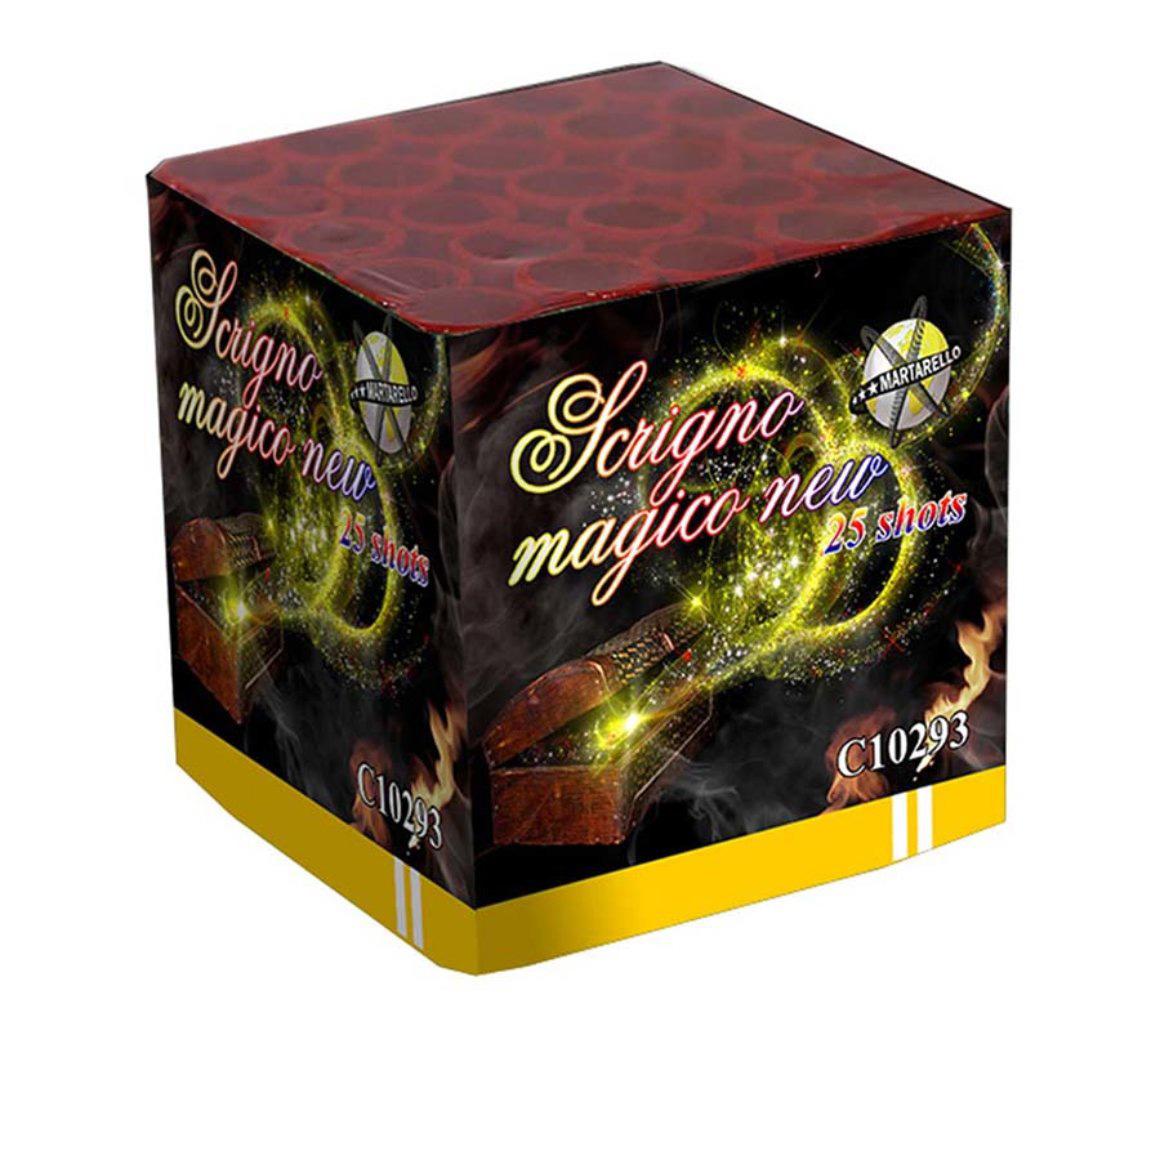 Scrignio Magico New C10293